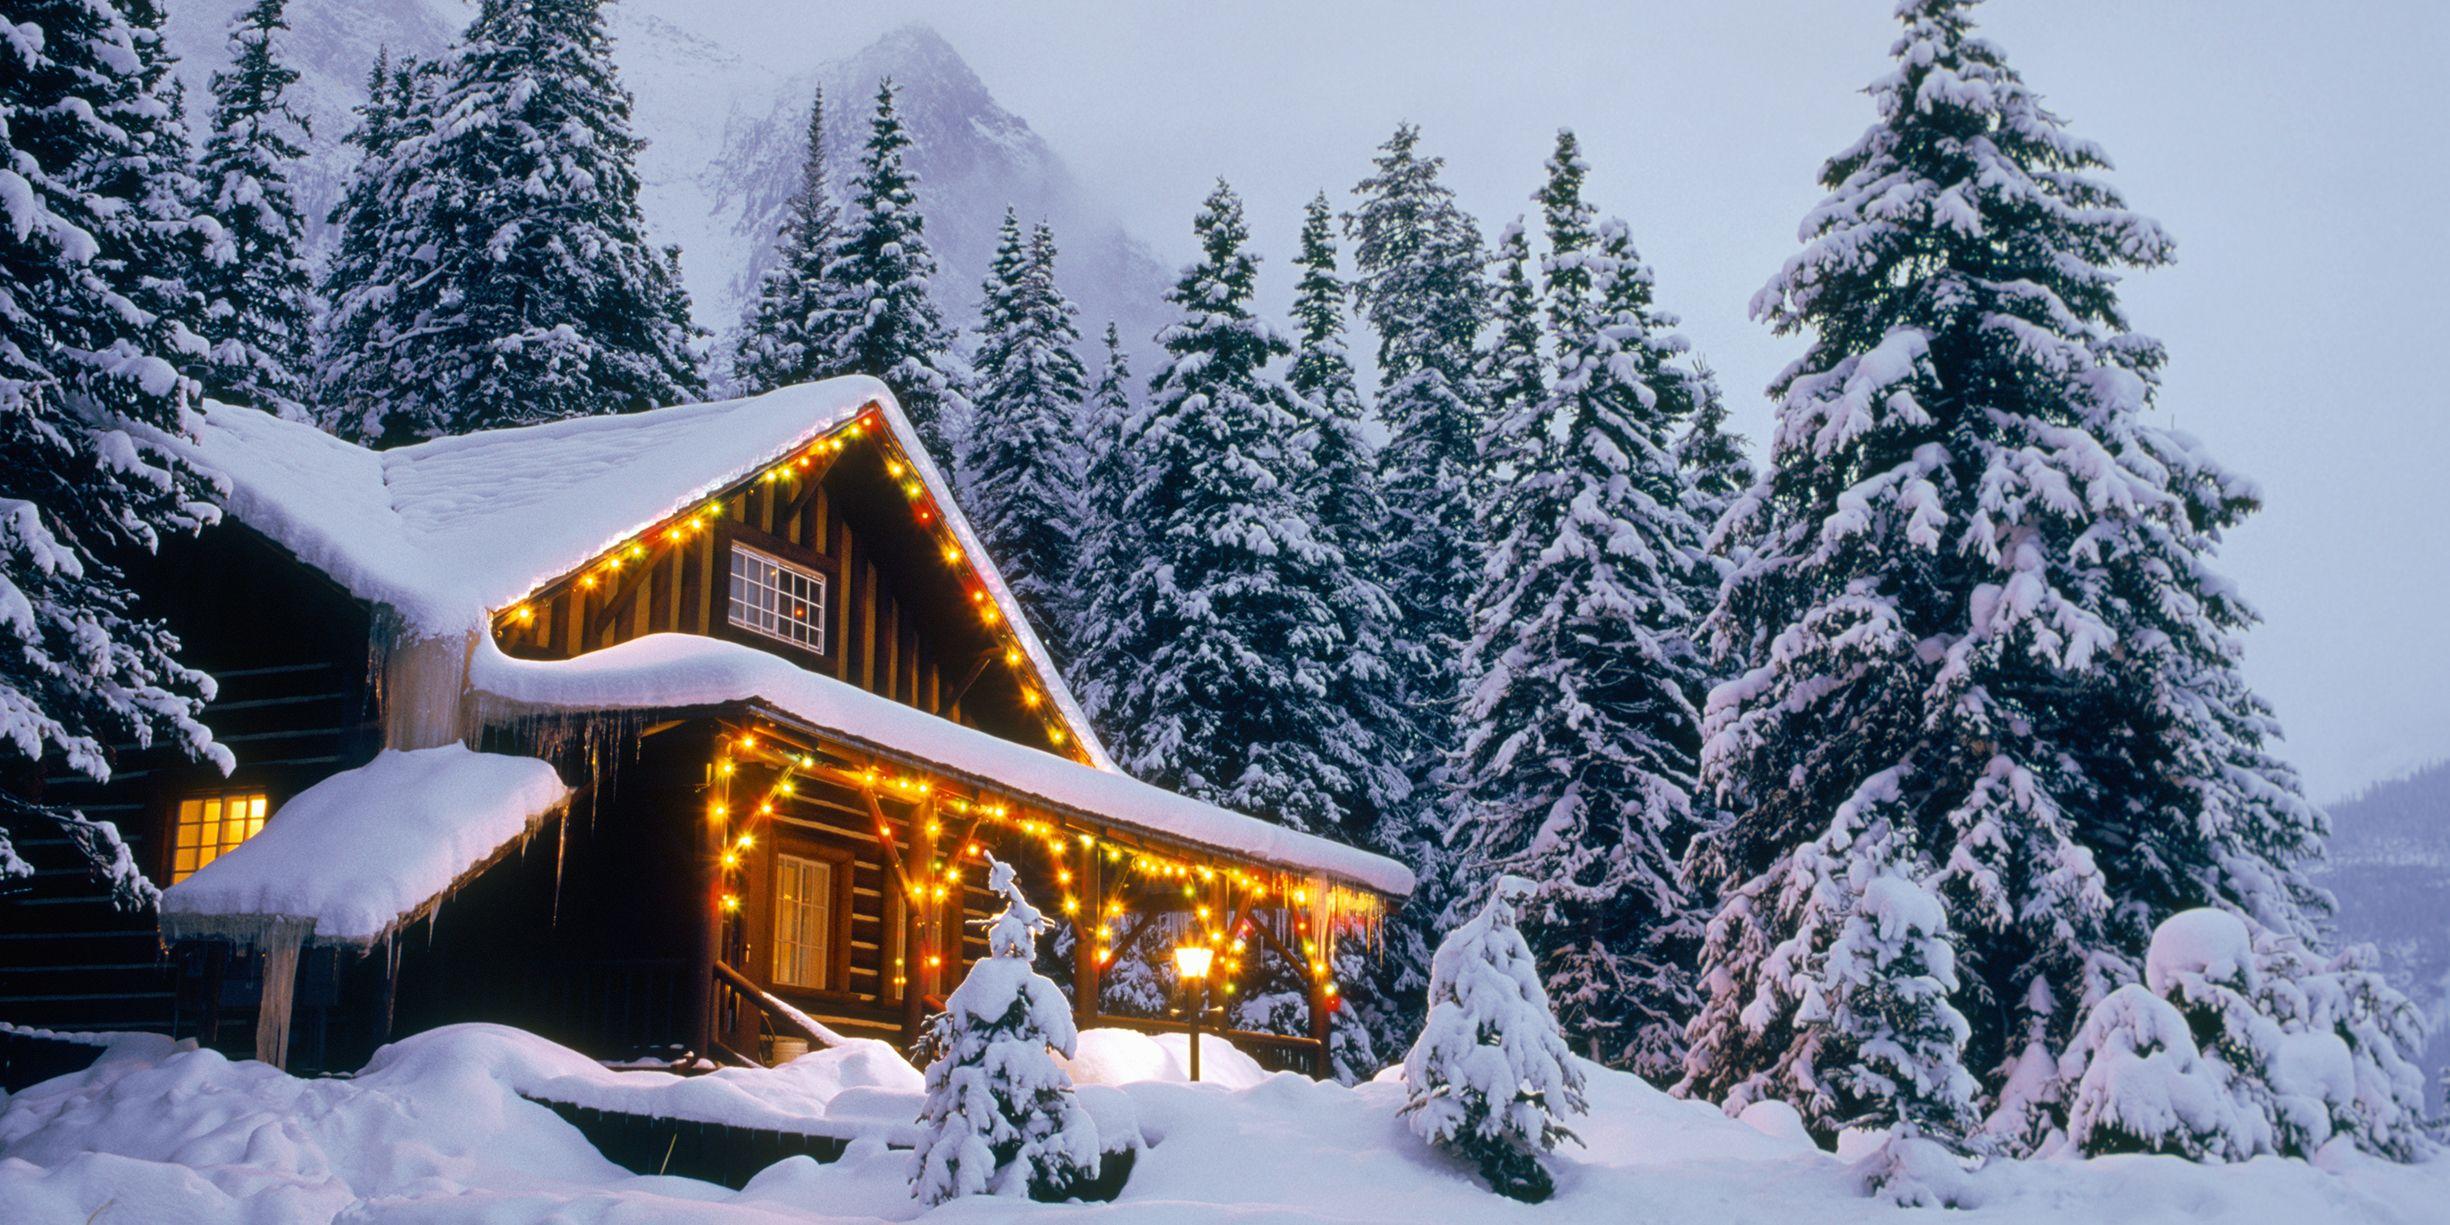 Snow Christmas Usa Chance 2021 White Christmas And Snow Forecast White Christmas Probability 2017